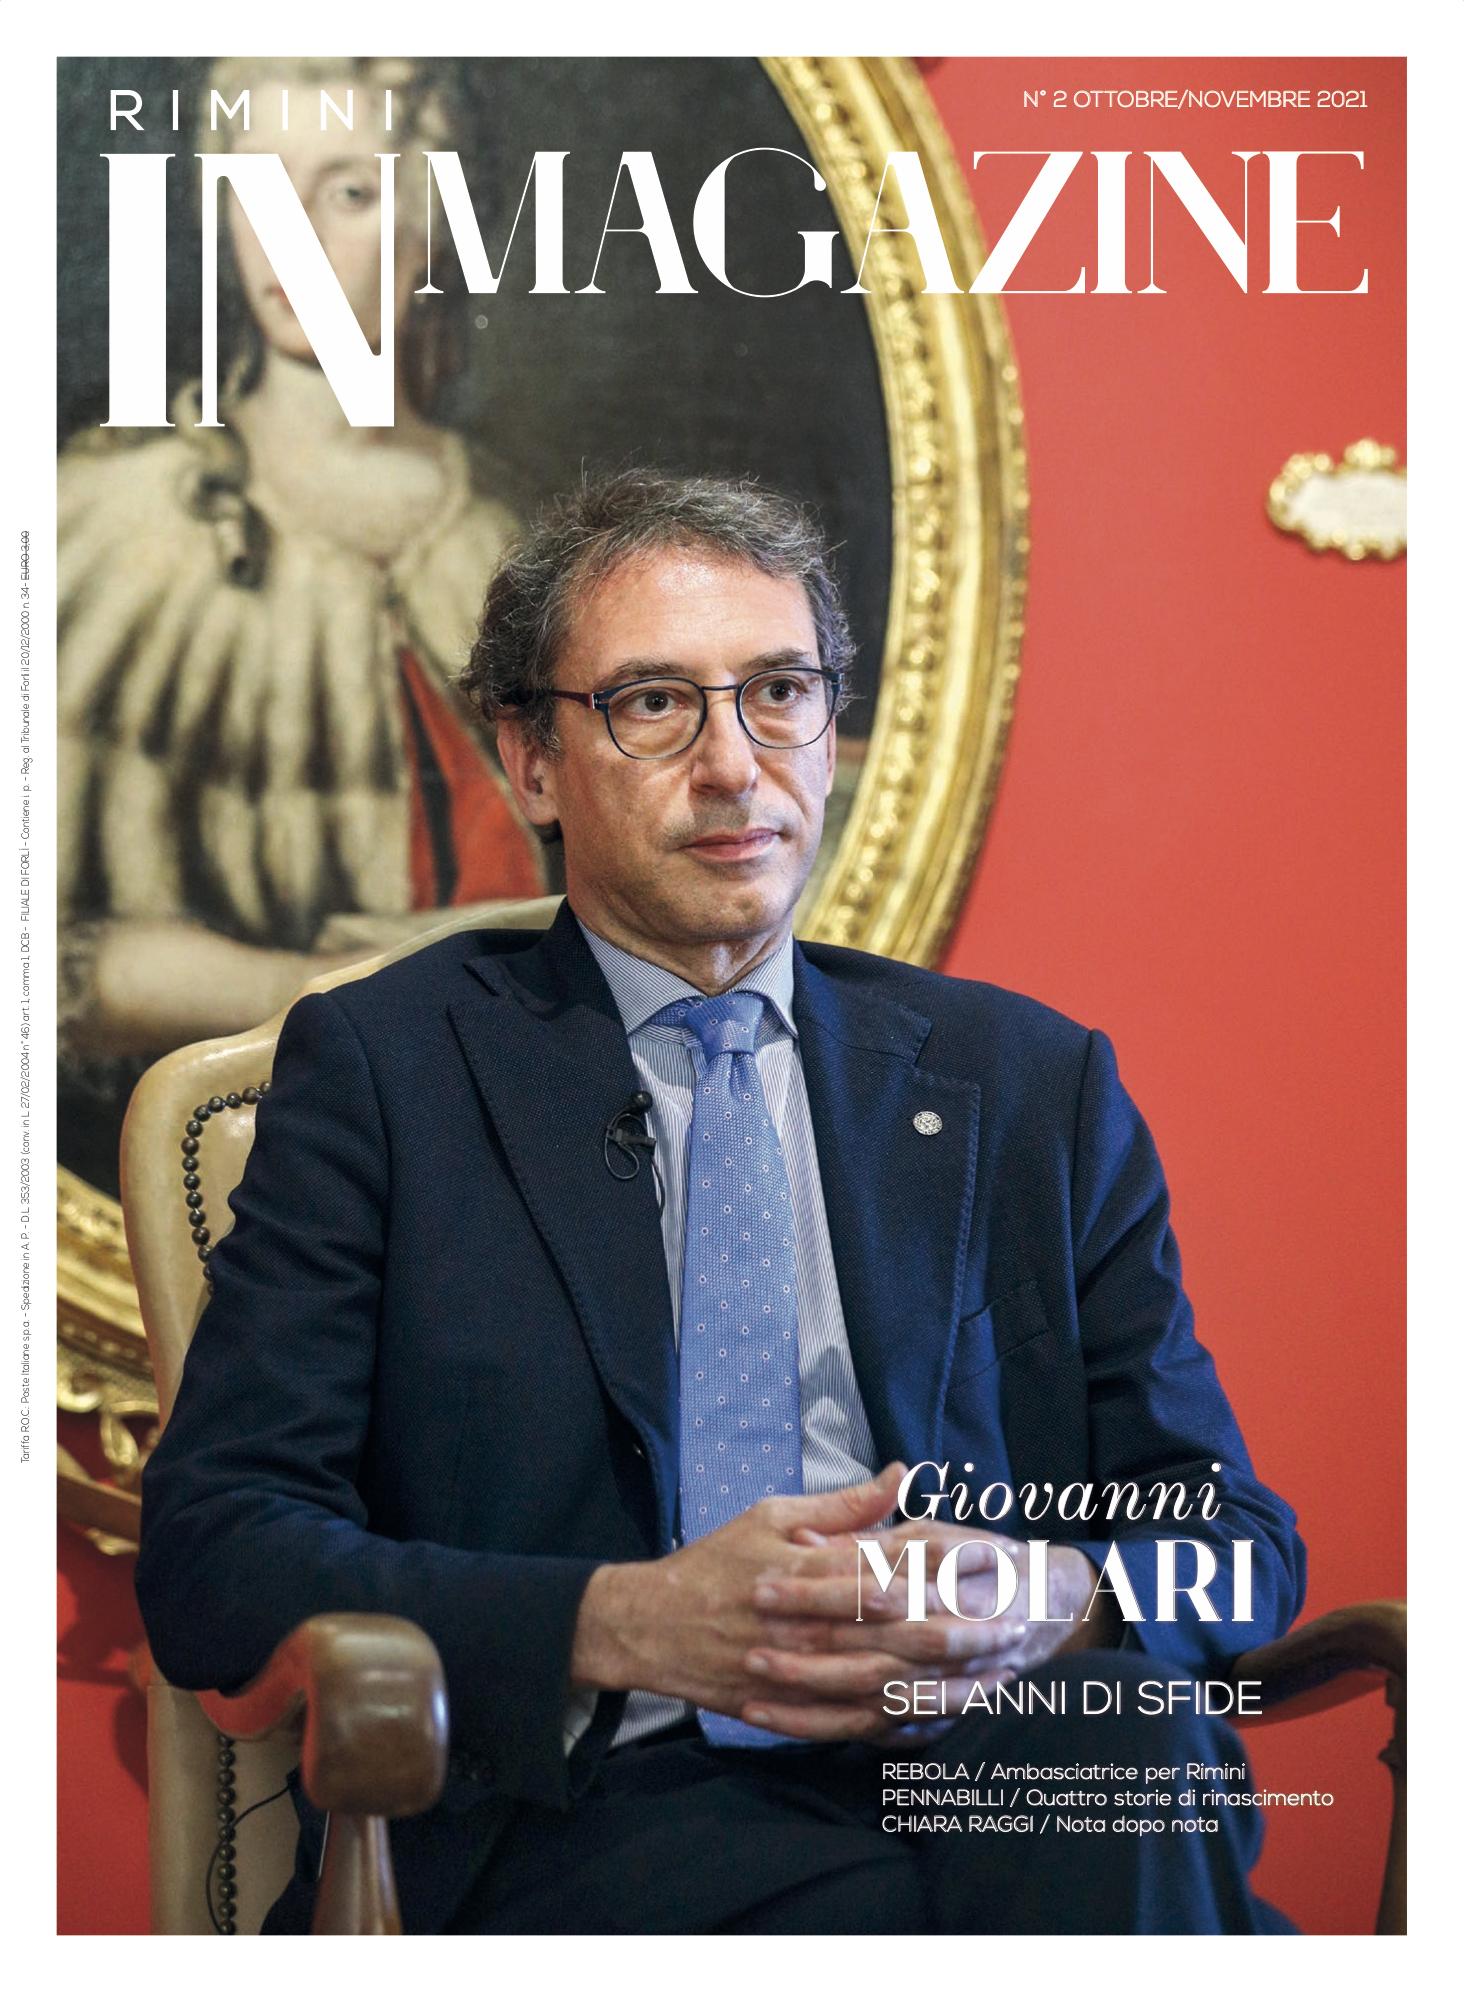 Rimini IN Magazine n. 4-2021: in copertina, Giovanni Molari